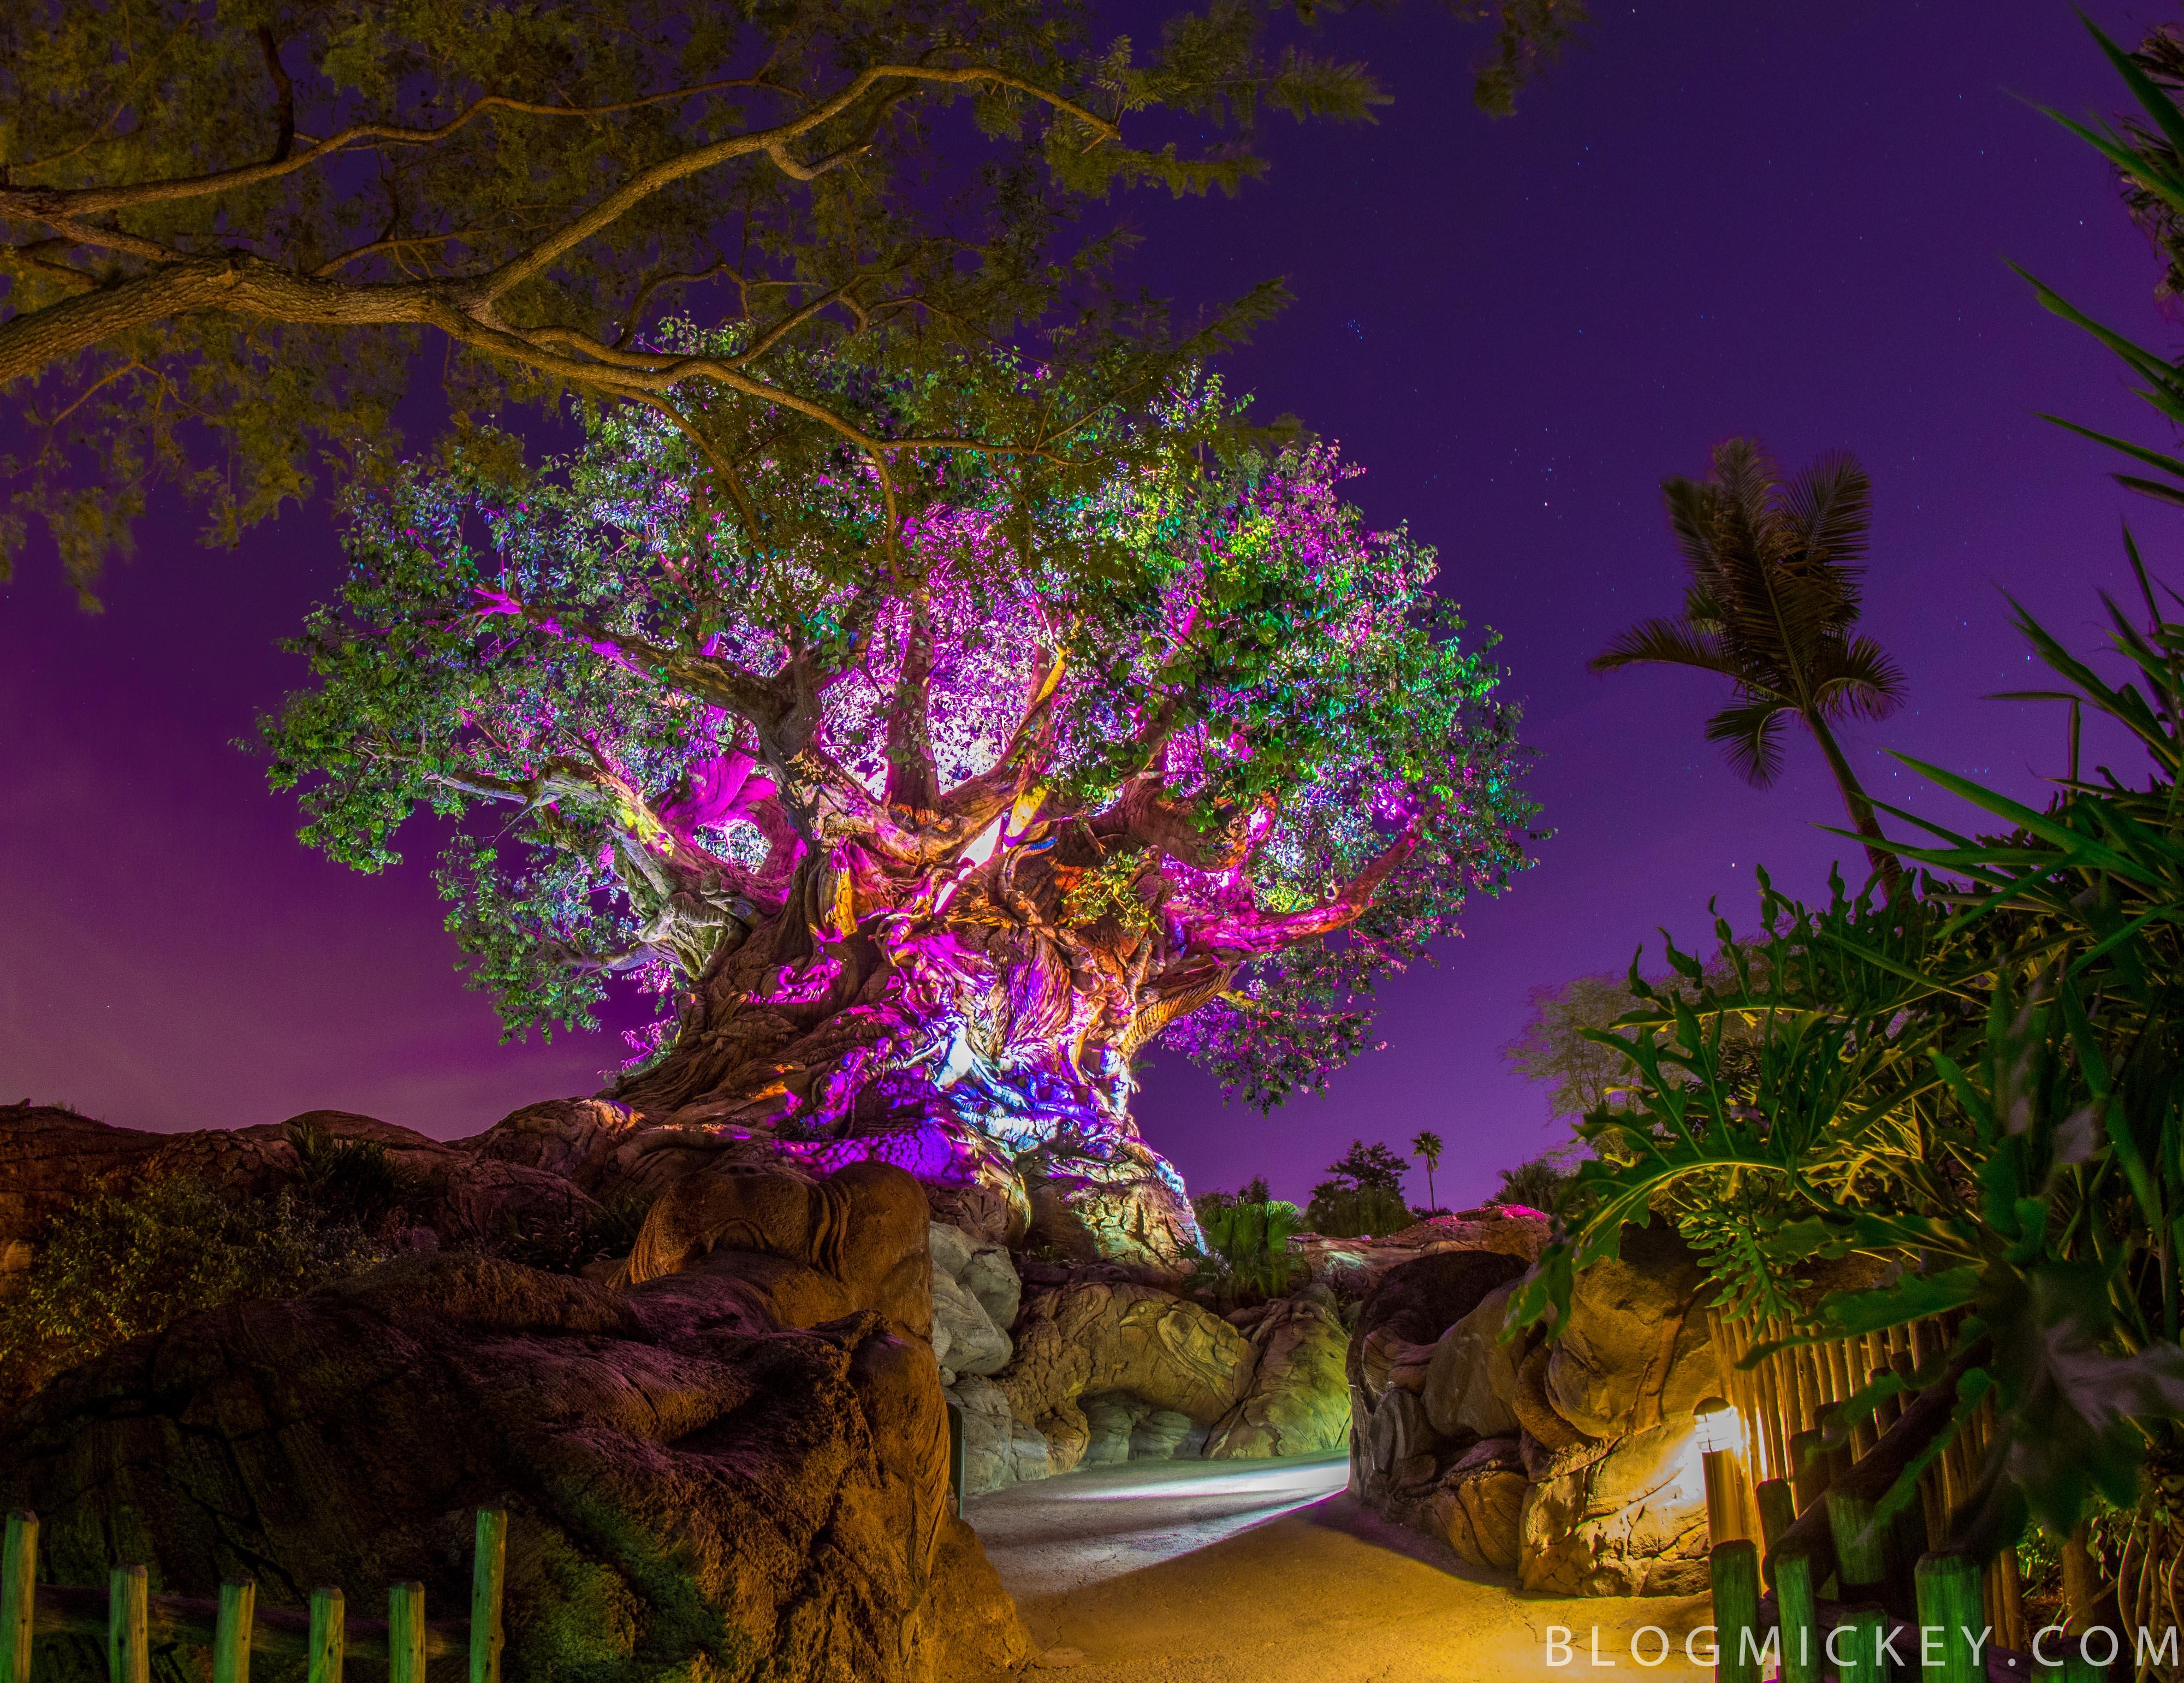 After dark tree of life garden after dark blog mickey for Trees garden of jane delawney blogspot